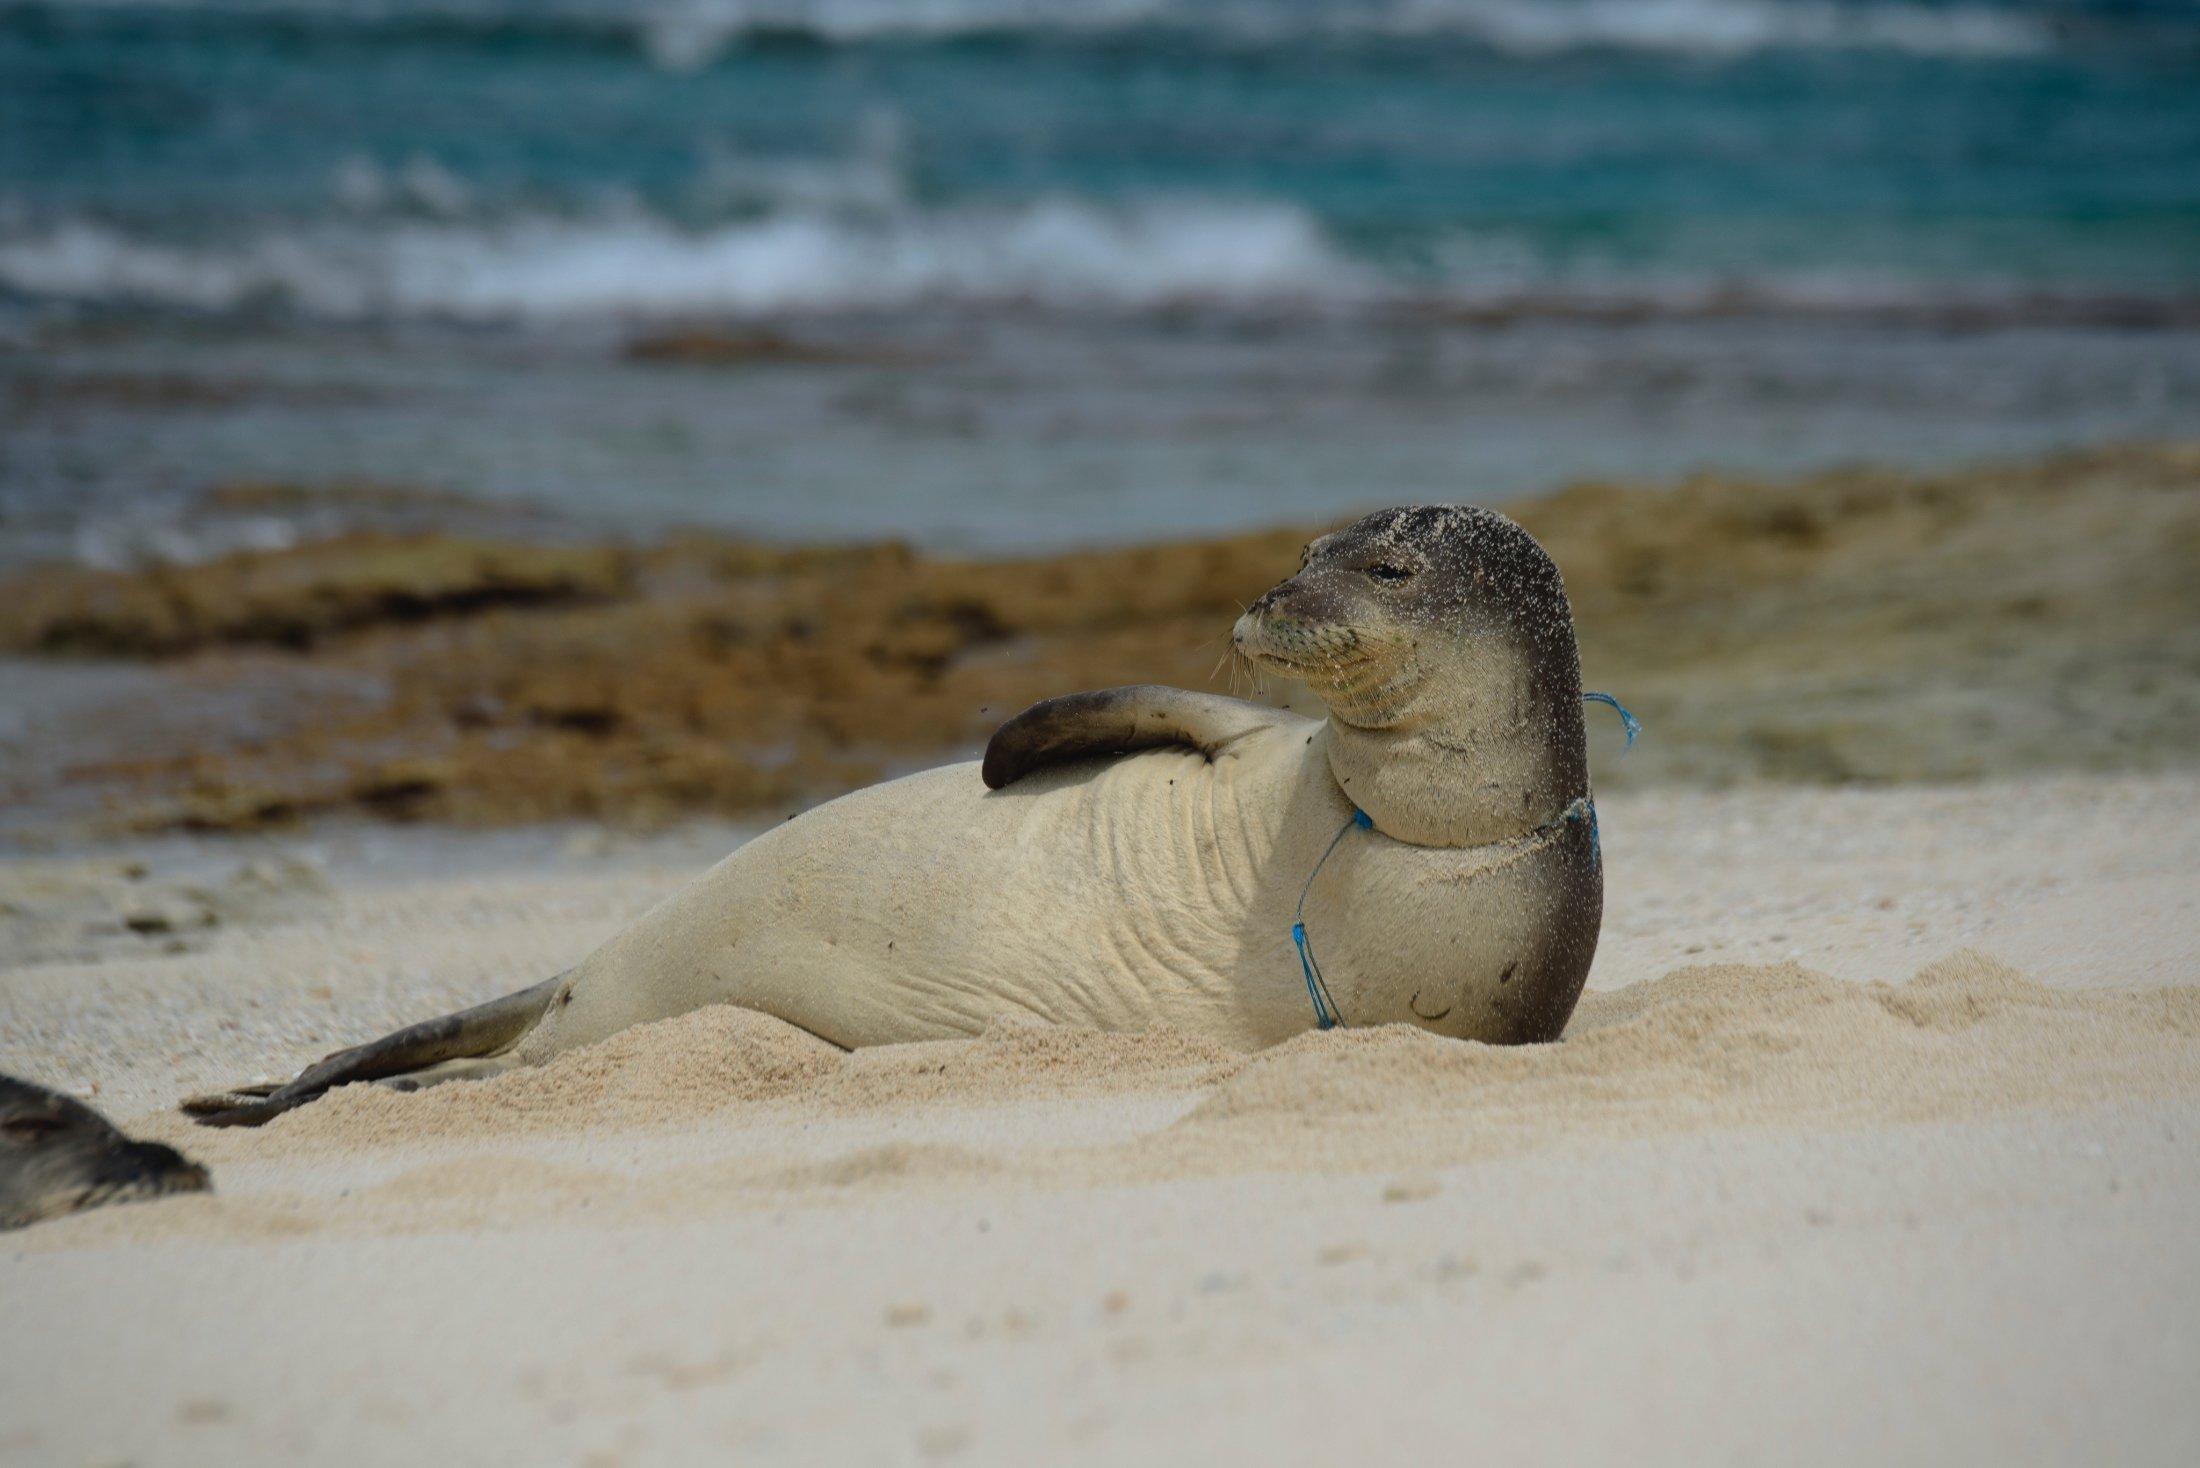 A female endangered Hawaiian monk seal is entangled in derelict fishing gear on the shores of Laysan Island in the Northwestern Hawaiian Islands, Hawaii, April 3, 2021. (Papahanaumokuakea Marine Debris Project via AP)